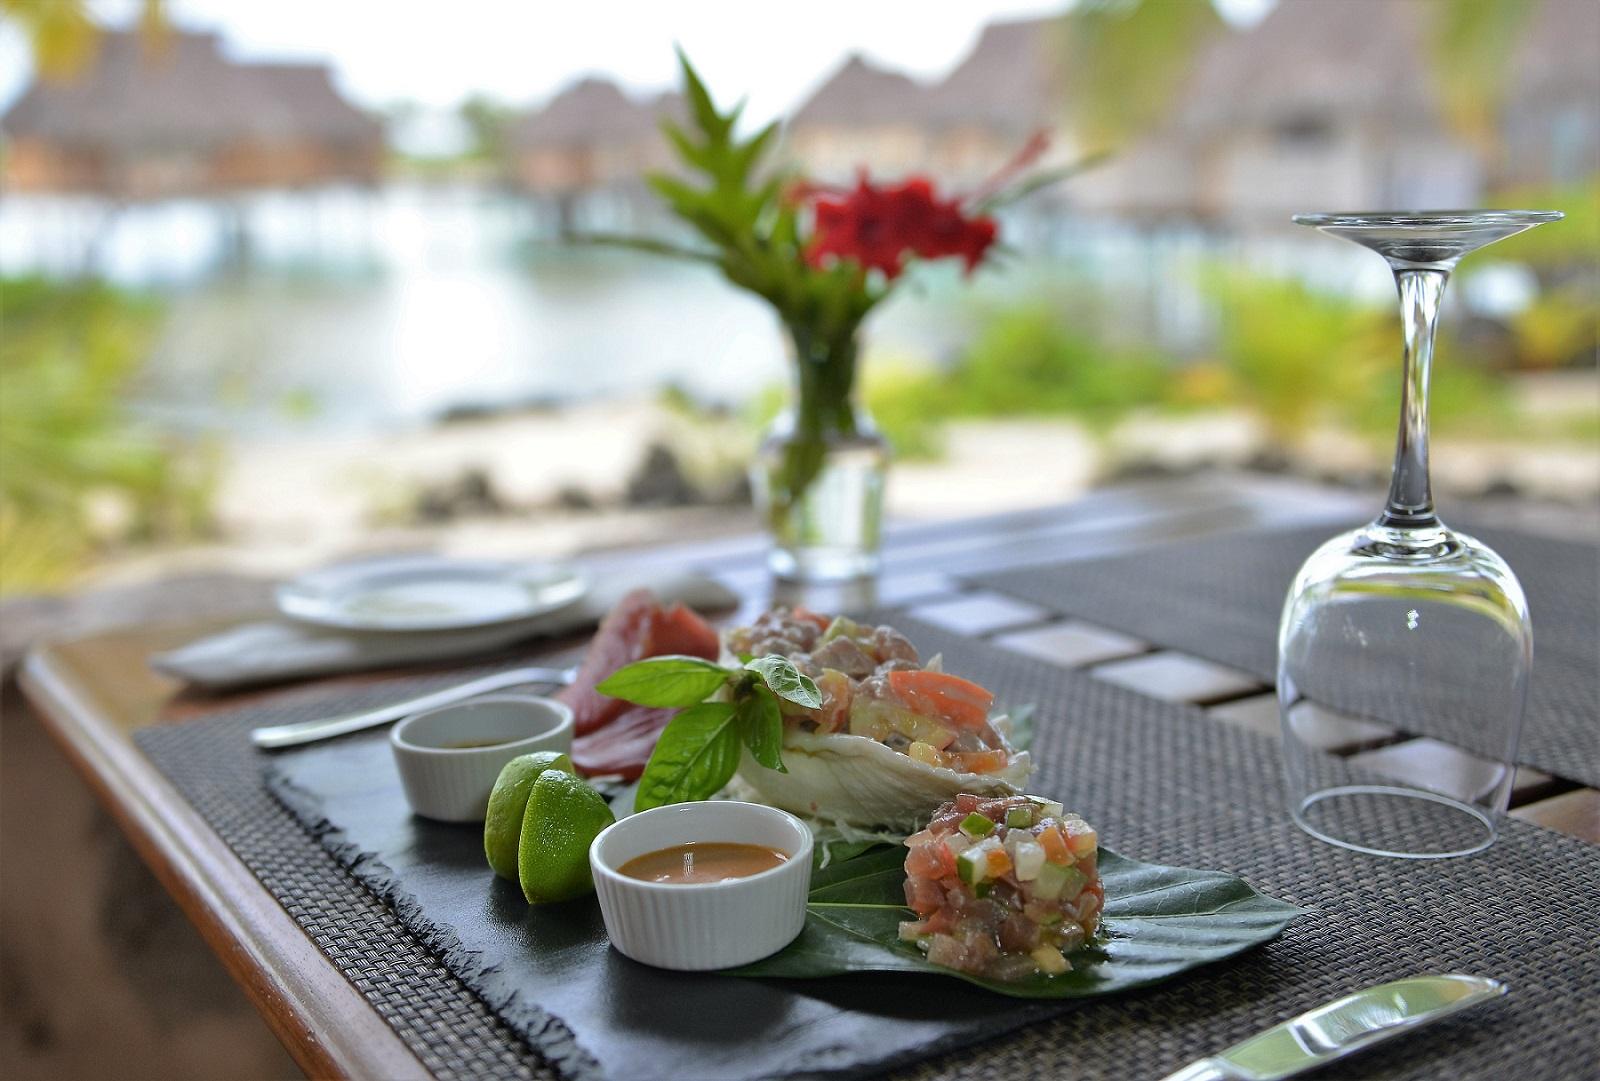 https://tahititourisme.com/wp-content/uploads/2021/10/TPBR-buffet-breakfast-®-M.Colombini-5-instagram-Copie.jpg